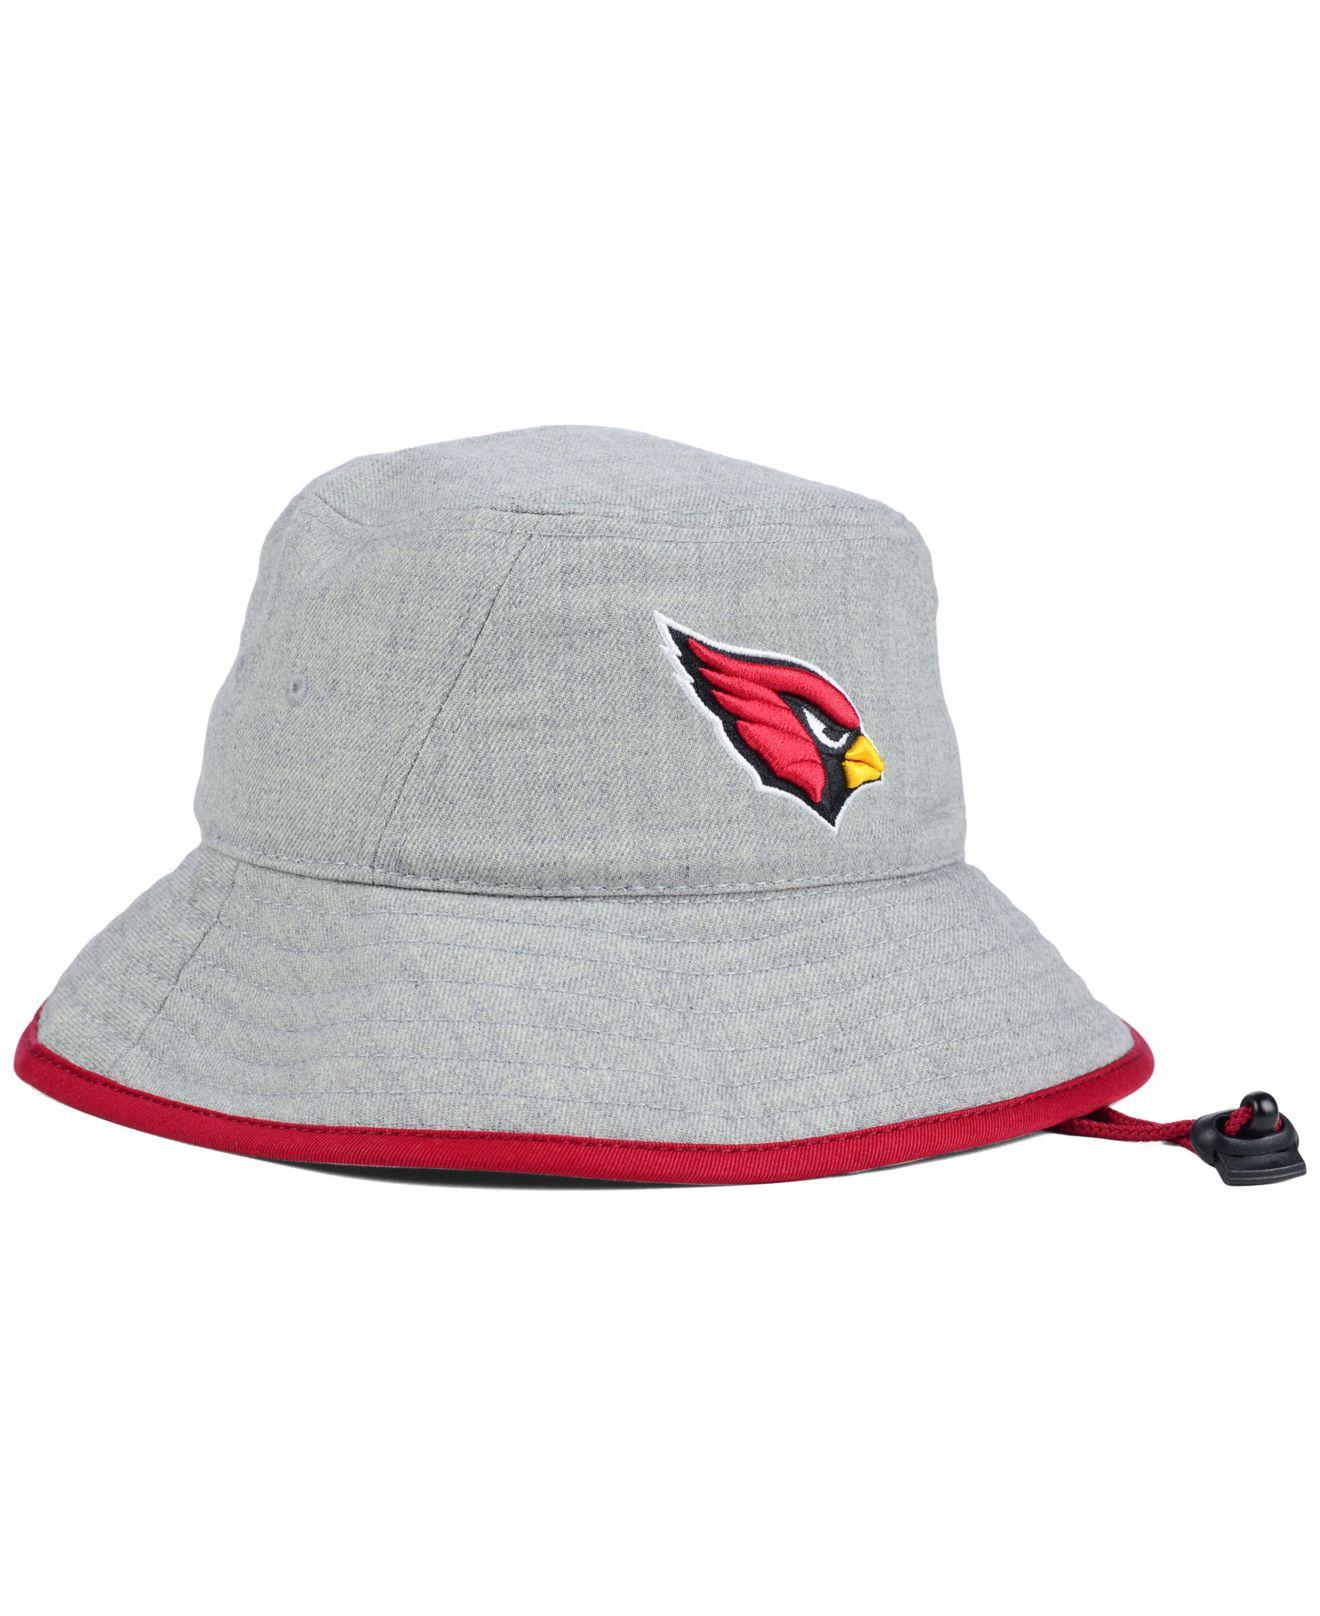 on sale efc01 56d39 ... where to buy lyst ktz arizona cardinals nfl heather gray bucket hat in  gray for men